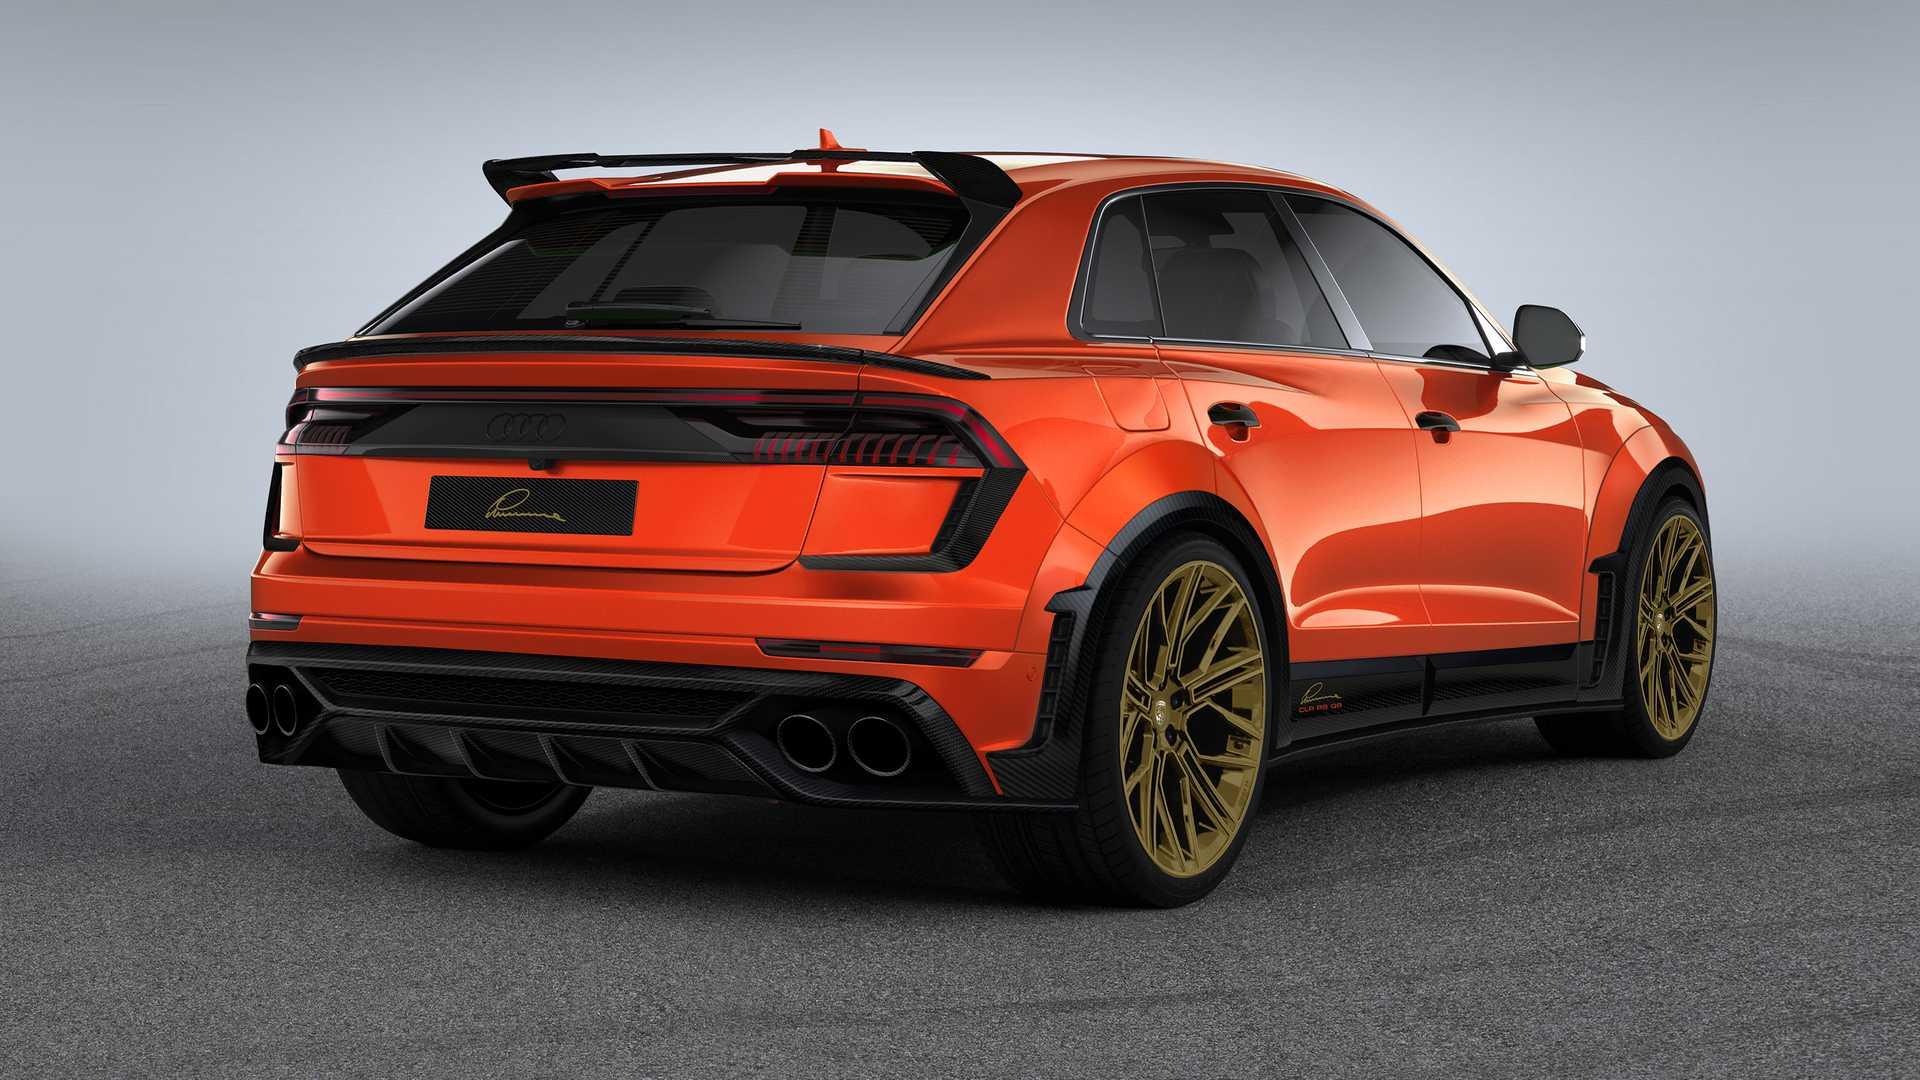 Audi-RS-Q8-CLR-8-RS-By-Lumma-Design-7